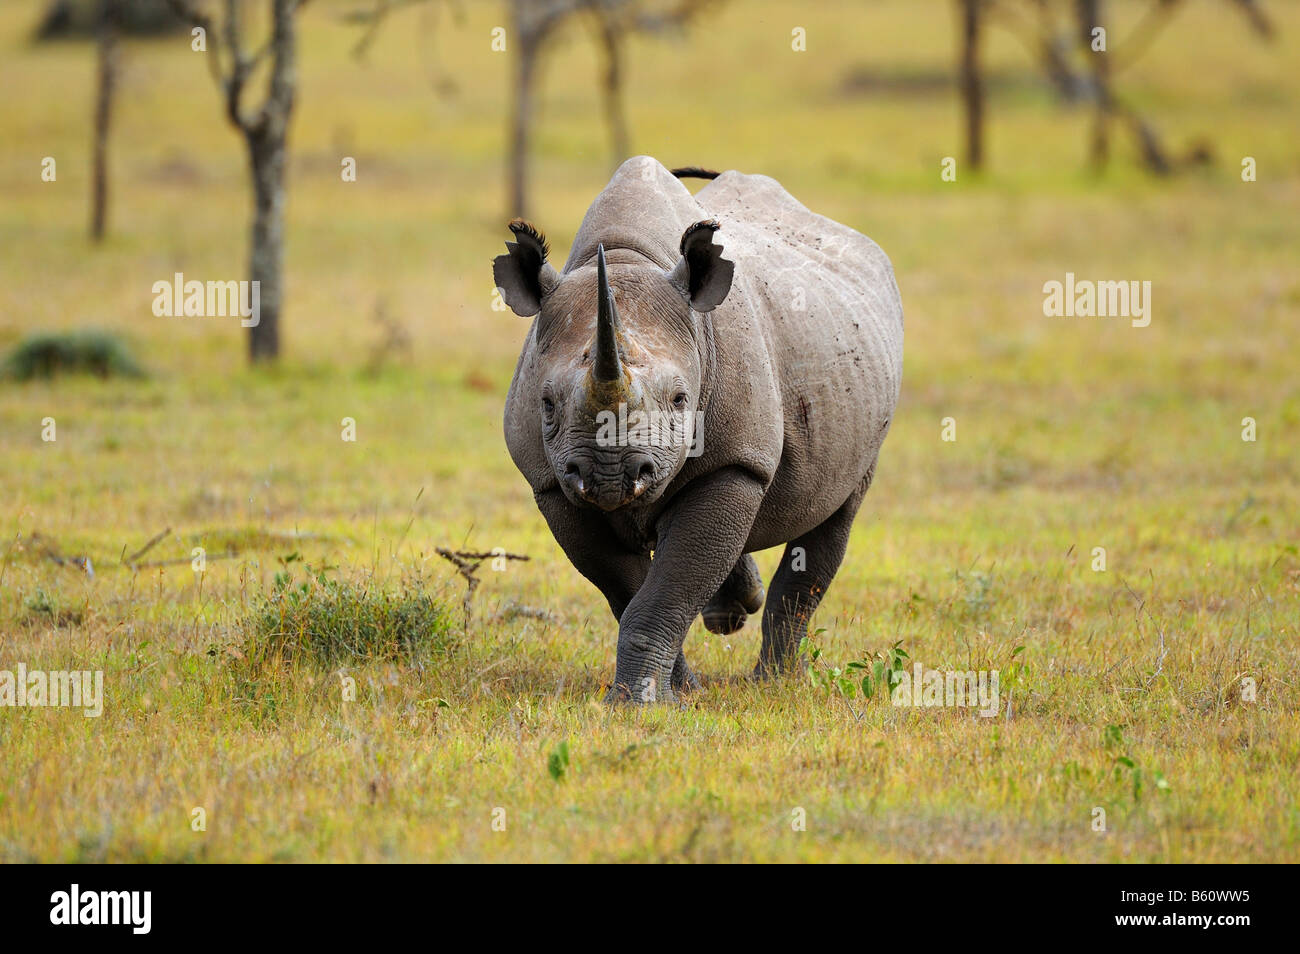 Black Rhinoceros (Diceros bicornis), charging, Sweetwater Game Reserve, Kenya, Africa - Stock Image